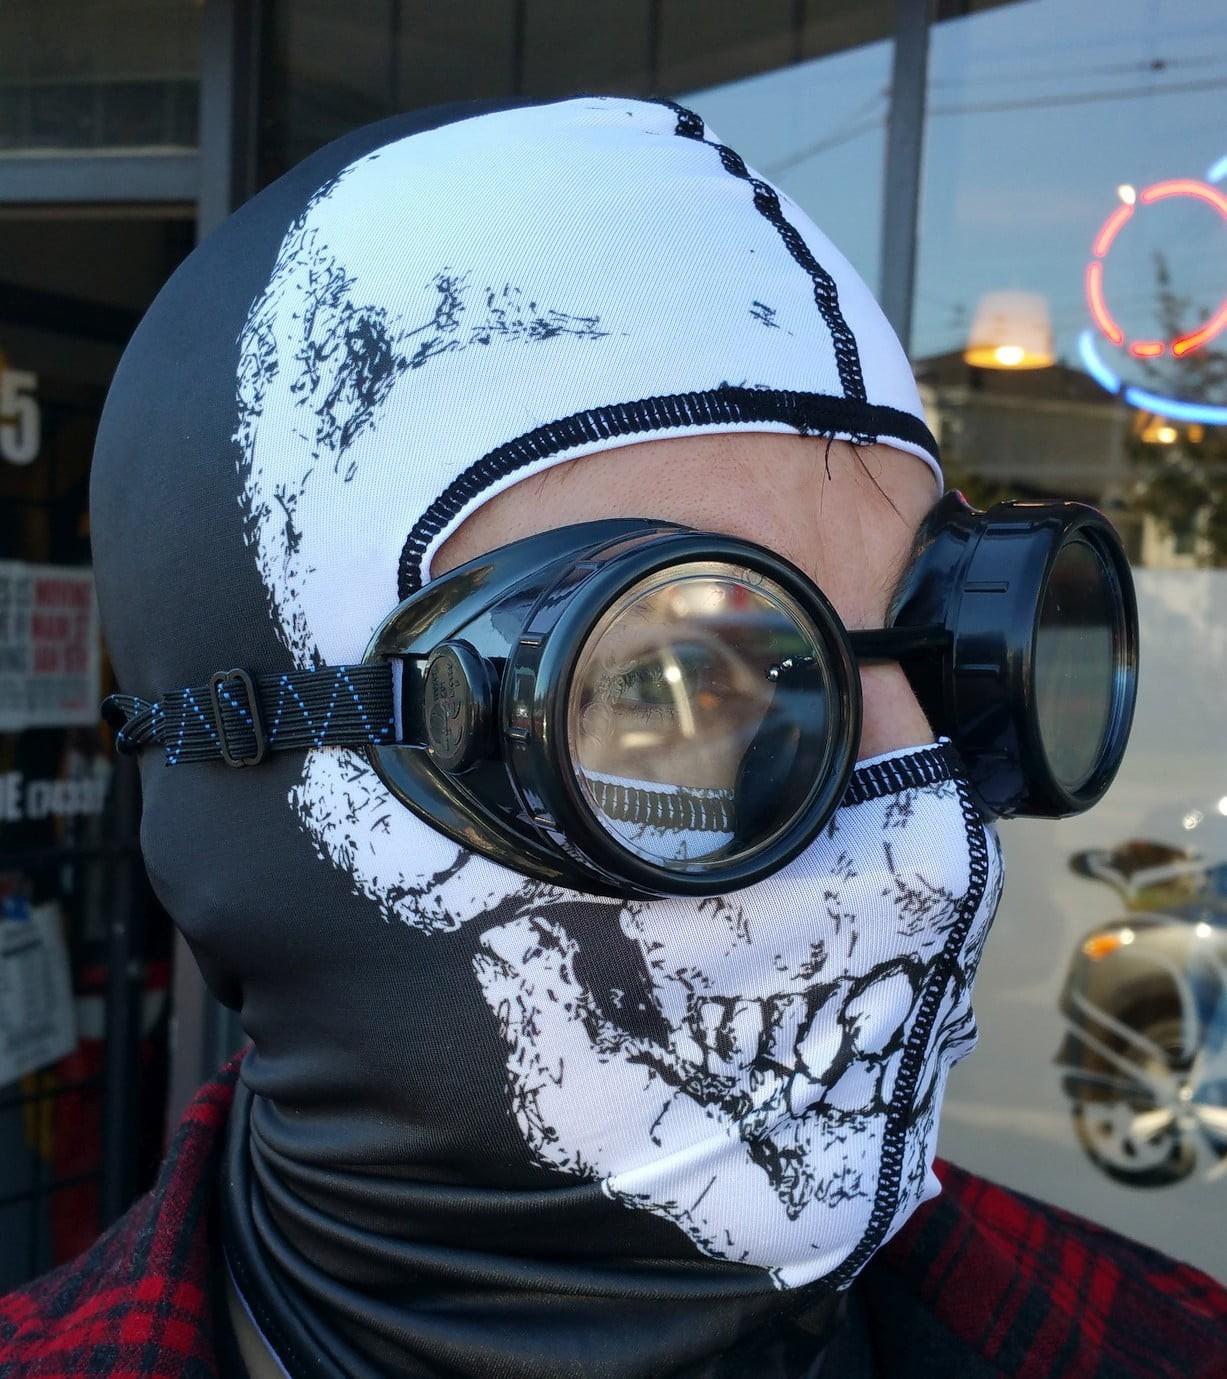 Neoprene face masks, balaclavas, and neck warmers.